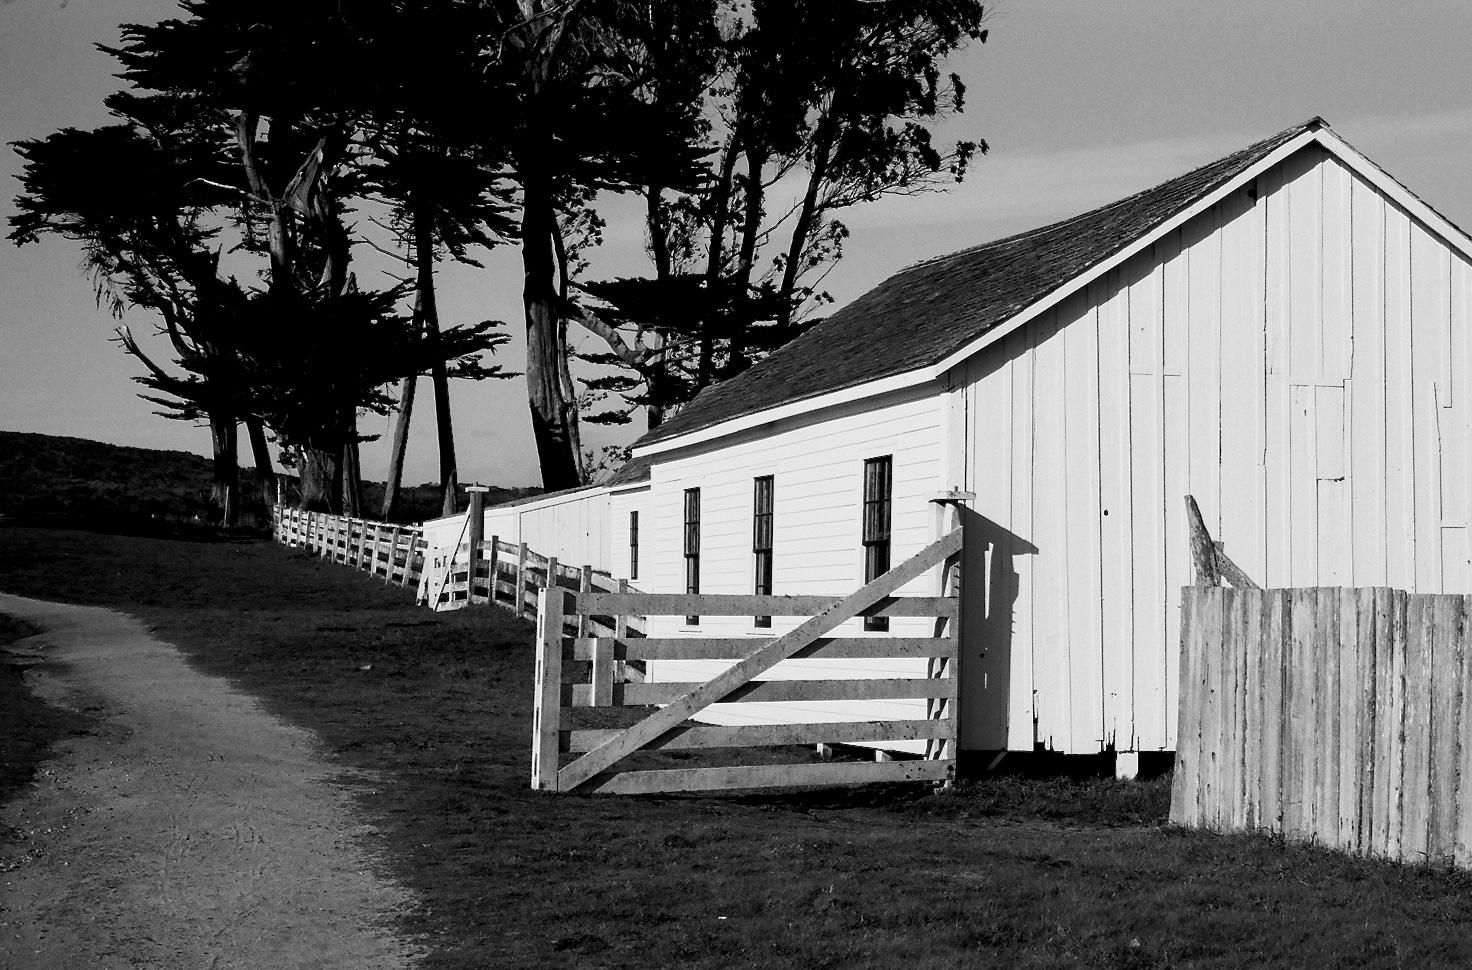 Pierce Point Ranch, Spotmatic SP, 50 Super Tak